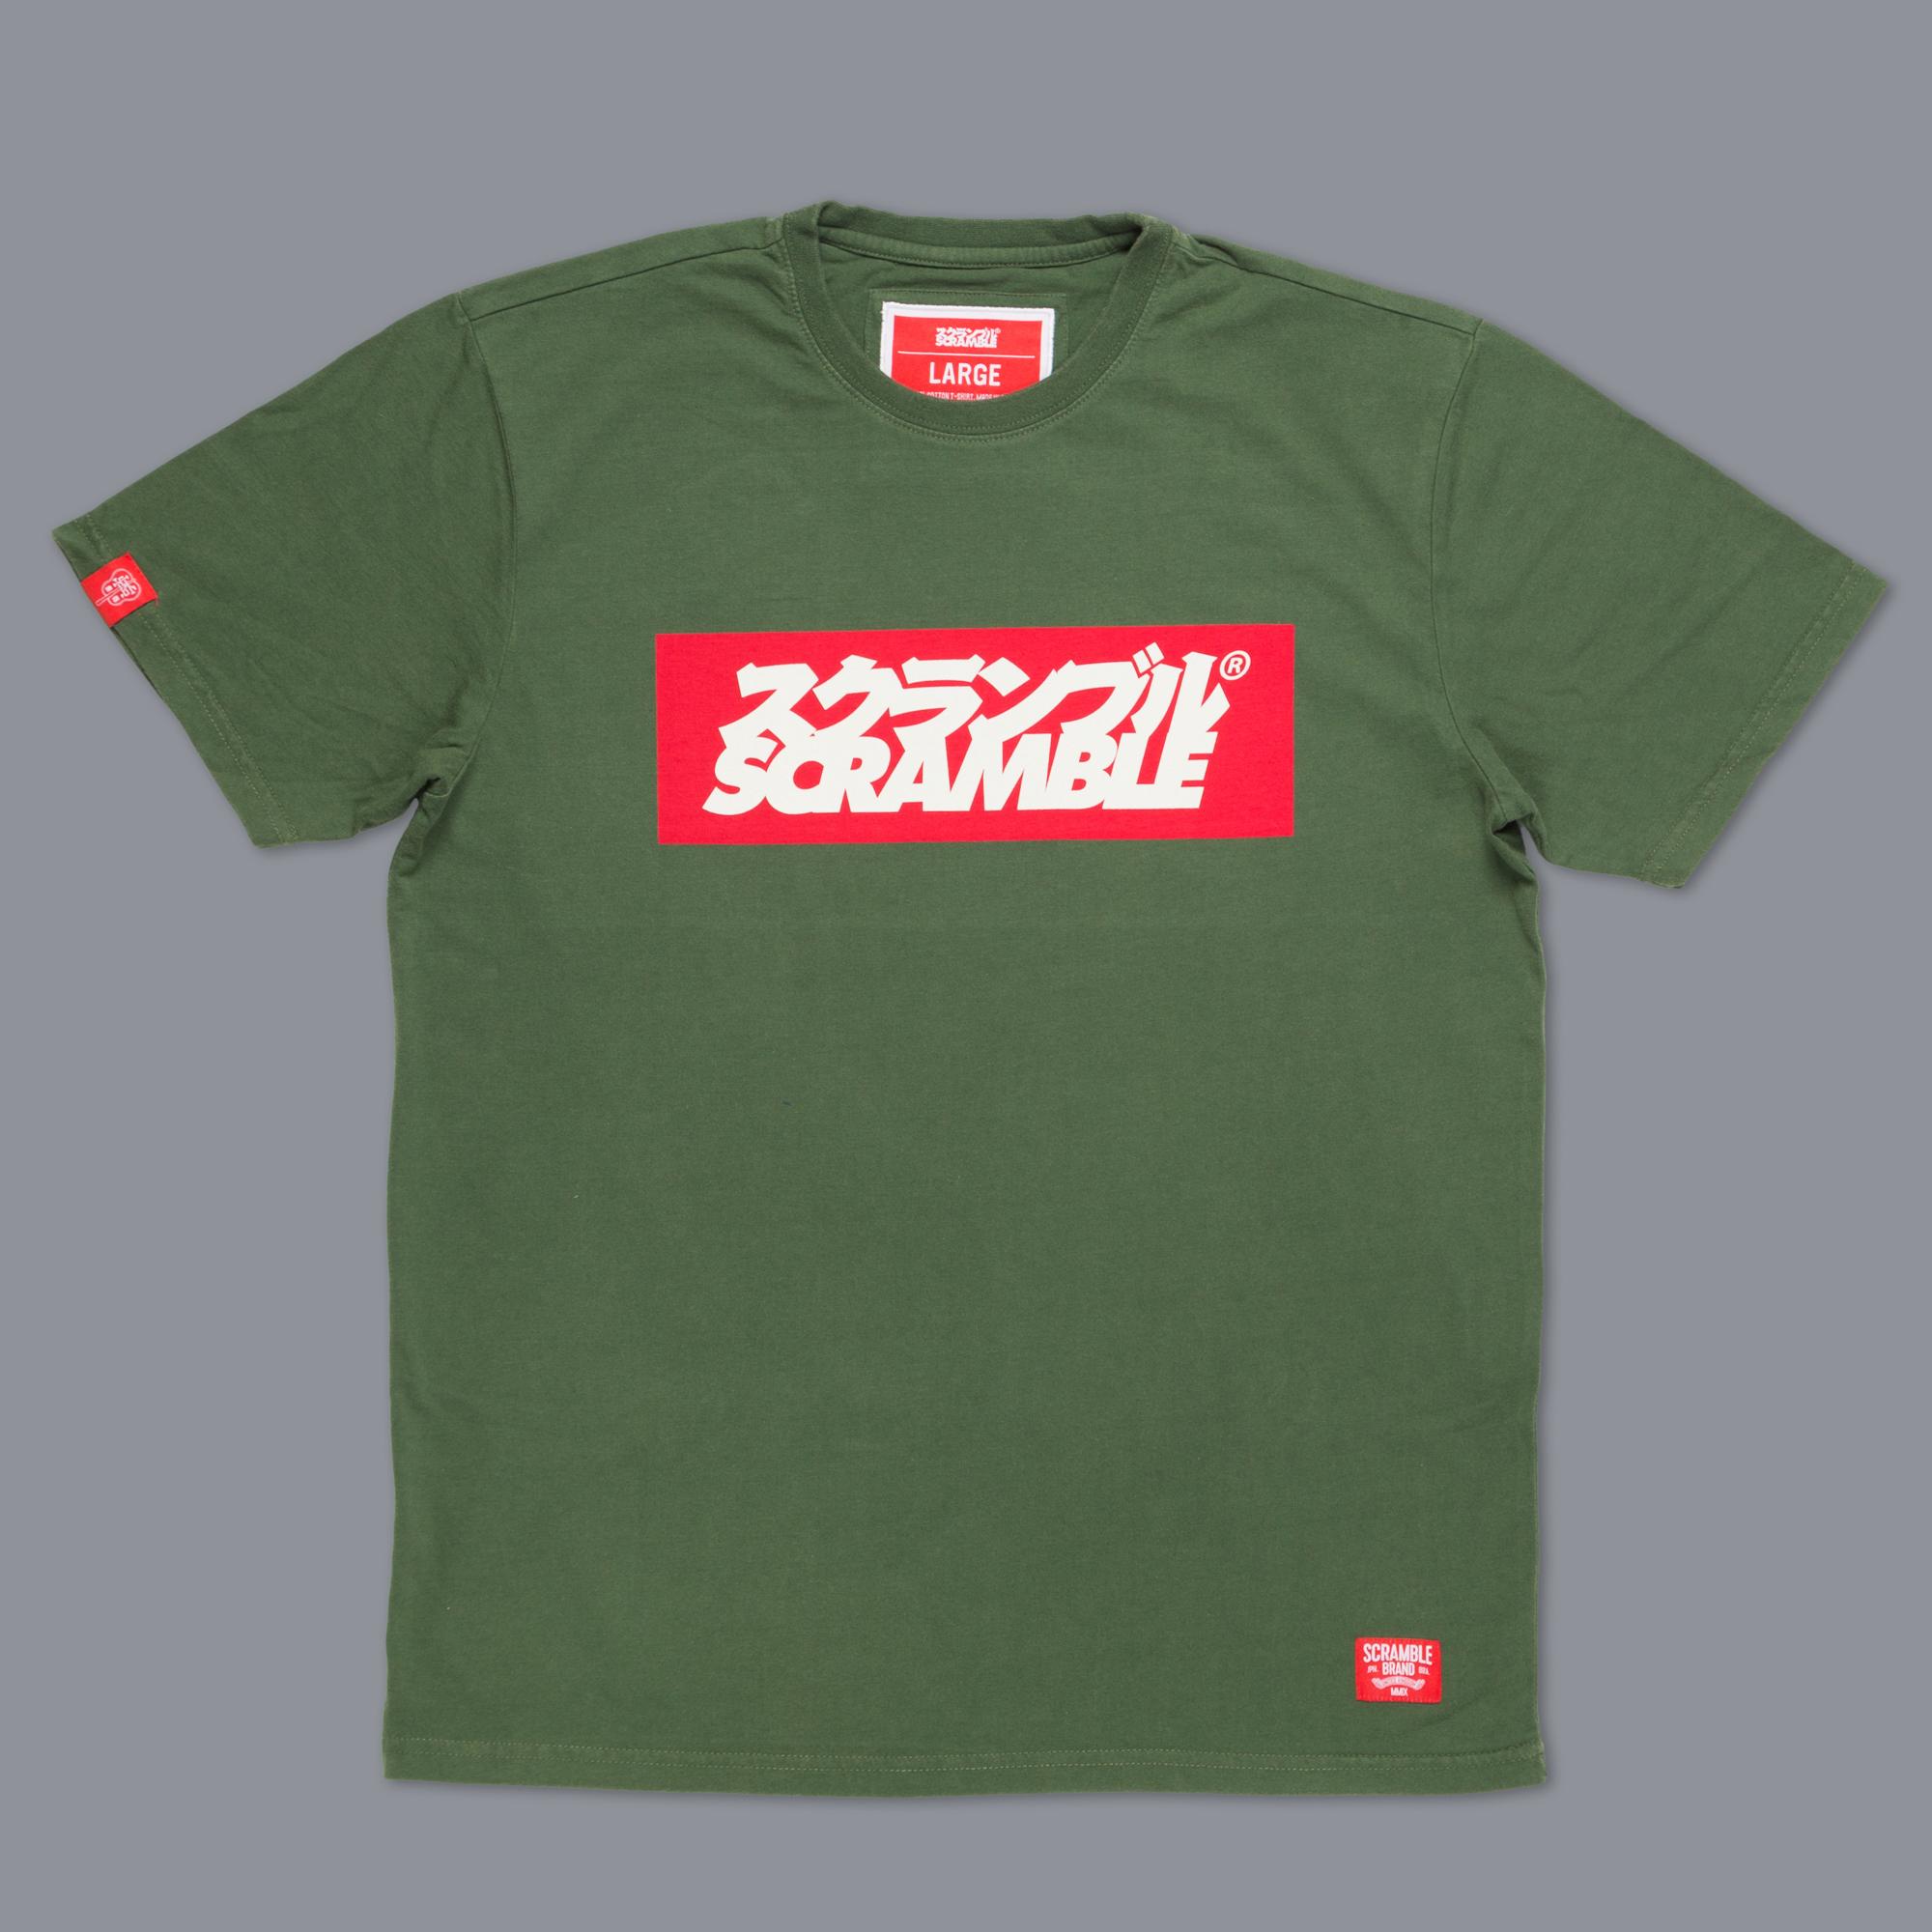 SCRAMBLE ブランドロゴ Tシャツ – グリーン